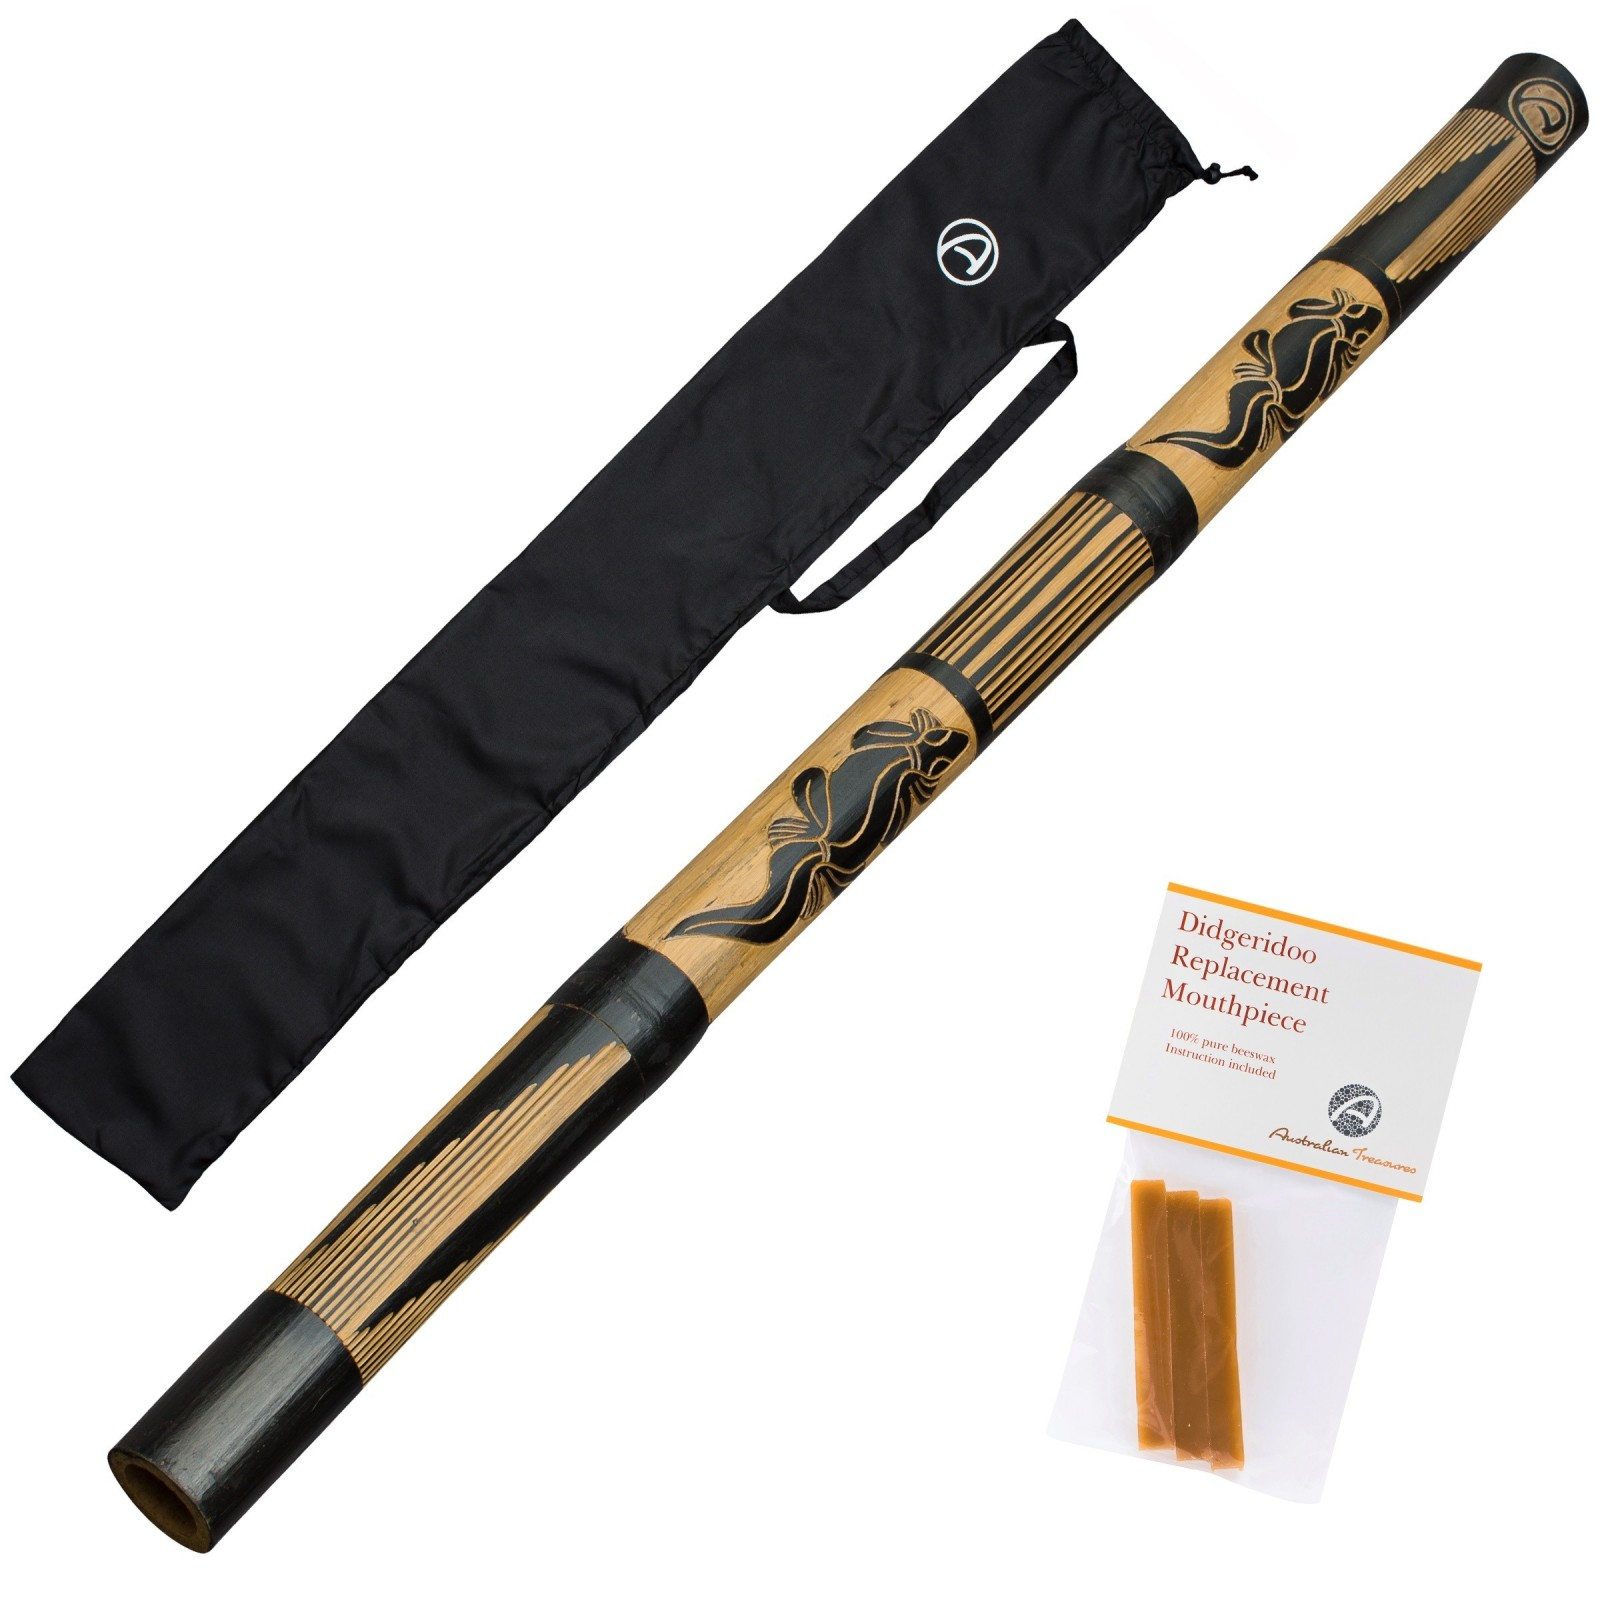 Bambus holz didgeridoo 120cm - Bienenwachs - Didgeridootasche  - Didgeridoo für Einsteiger